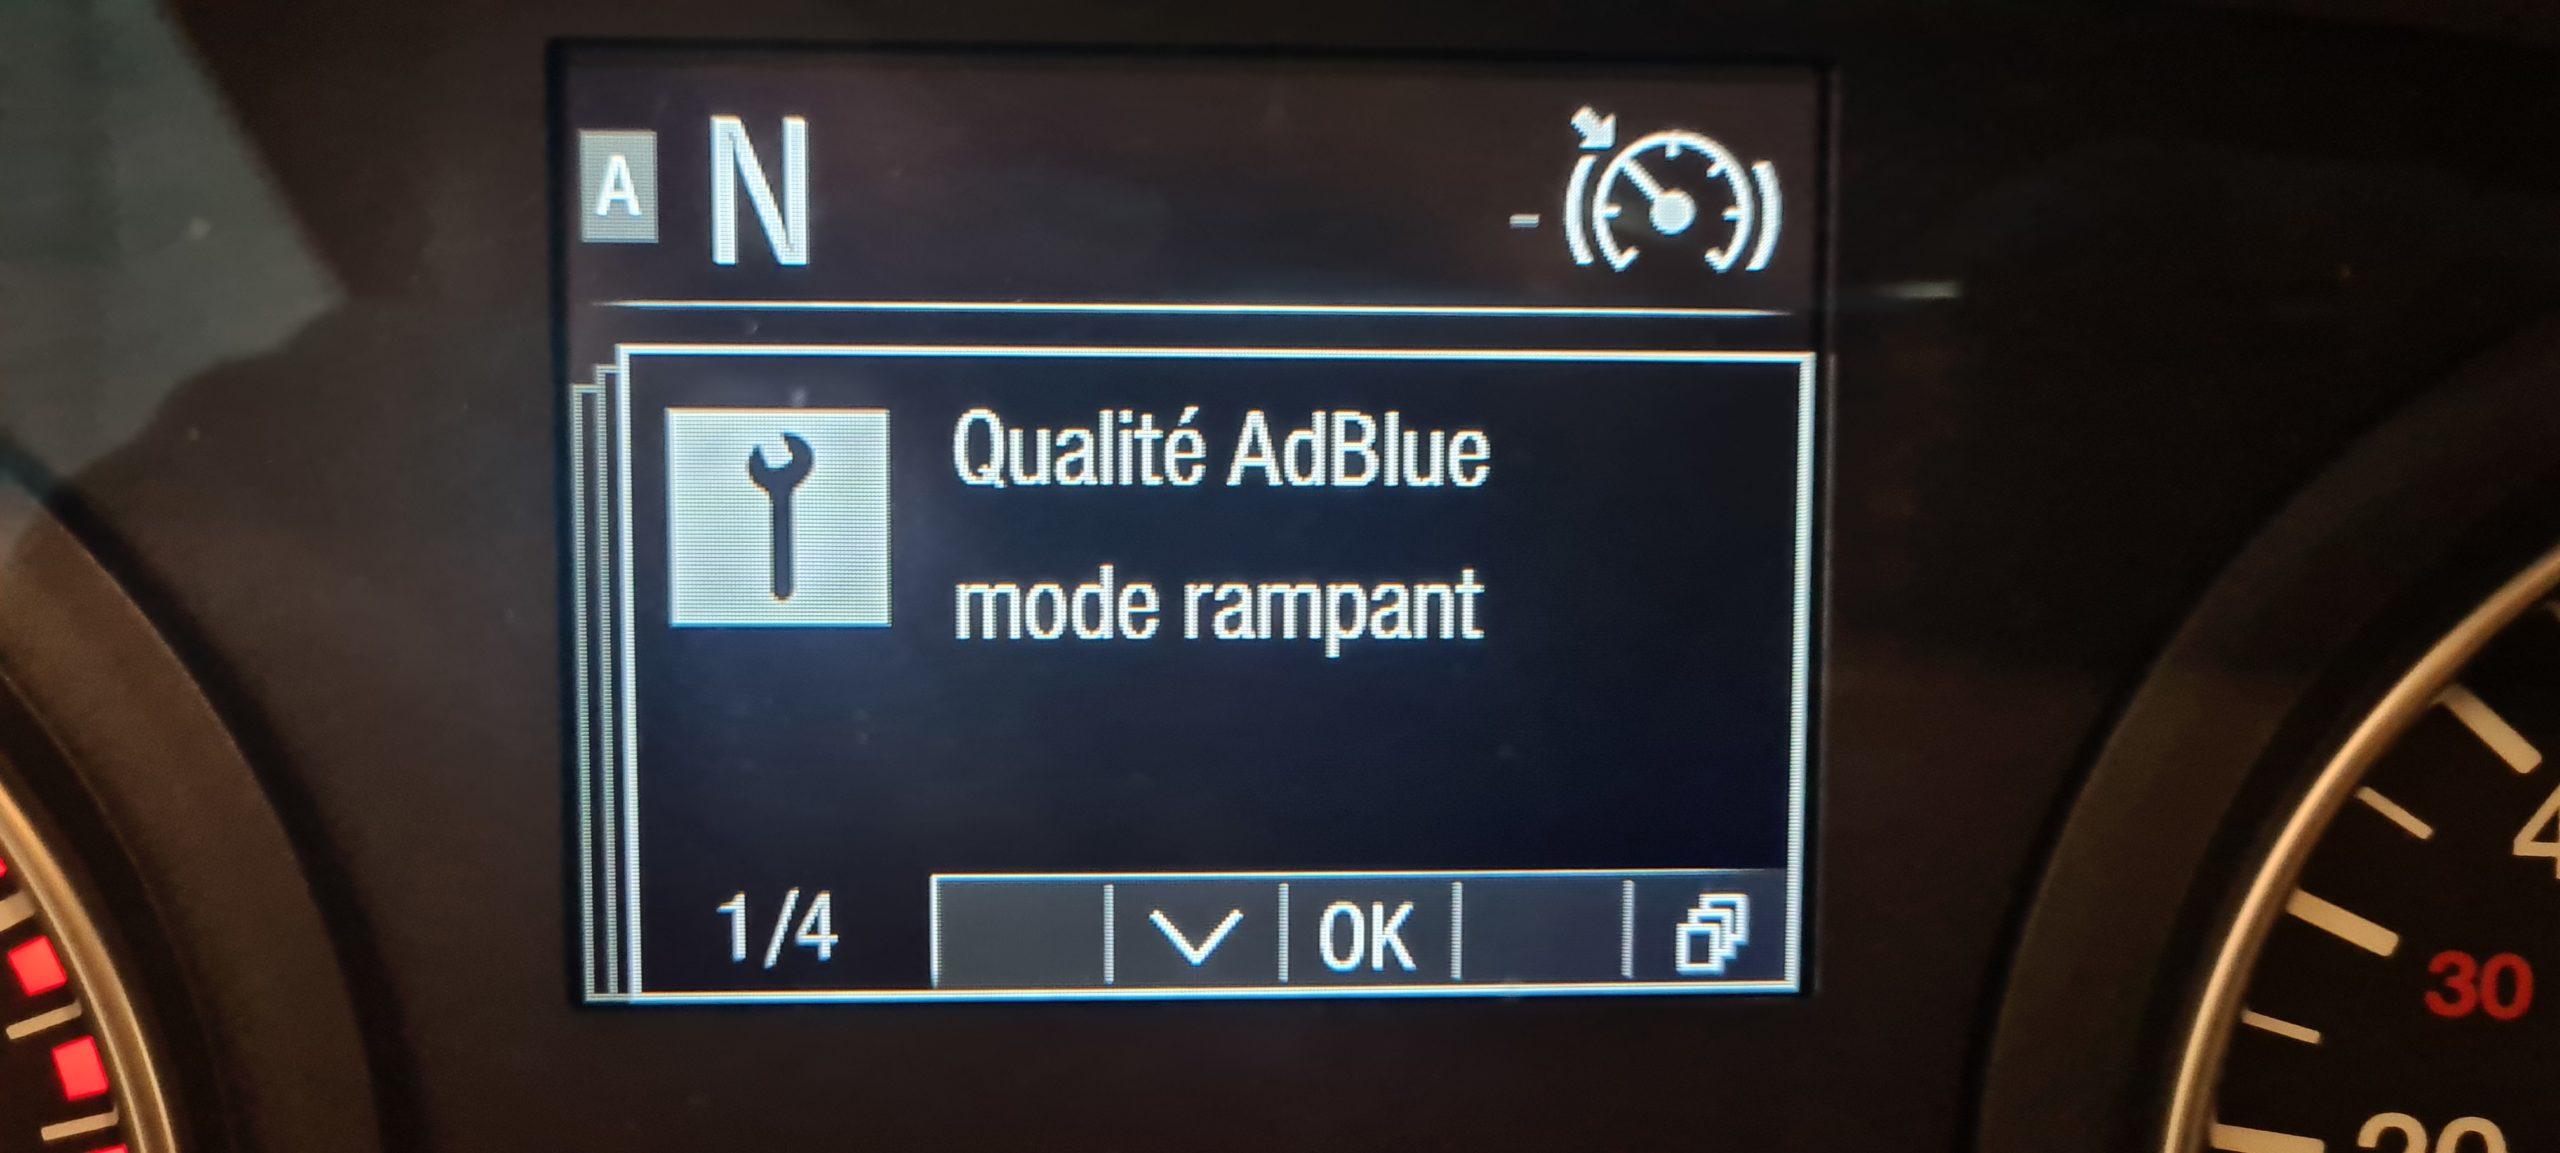 Mode rampant Man Euro 6 EDC 8131-02 8132-02 4535-01 Adblue SCR